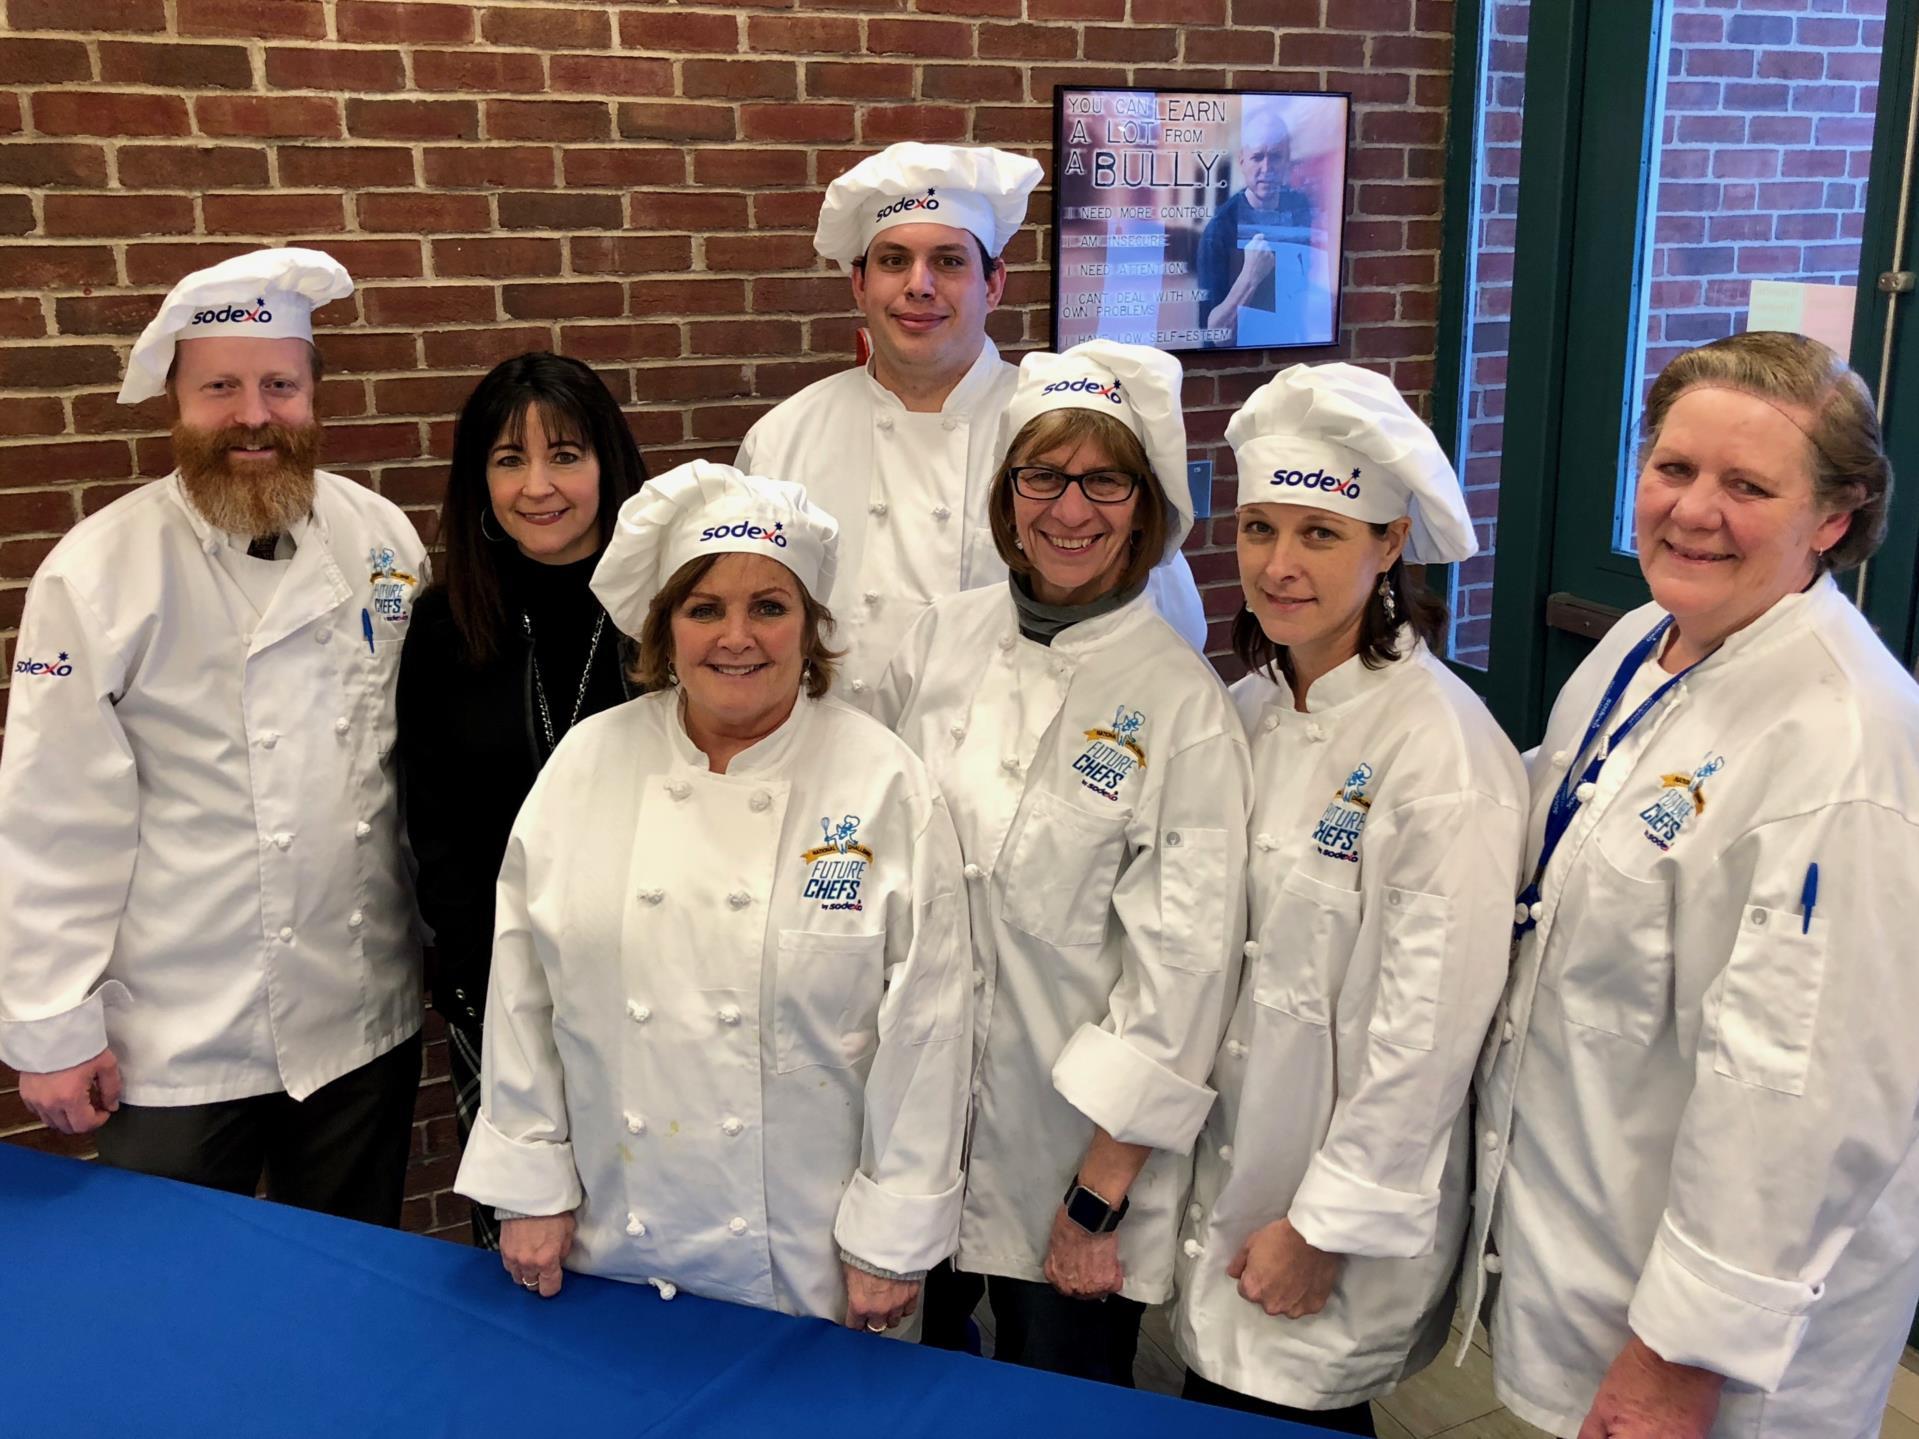 Food Service Staff Photo